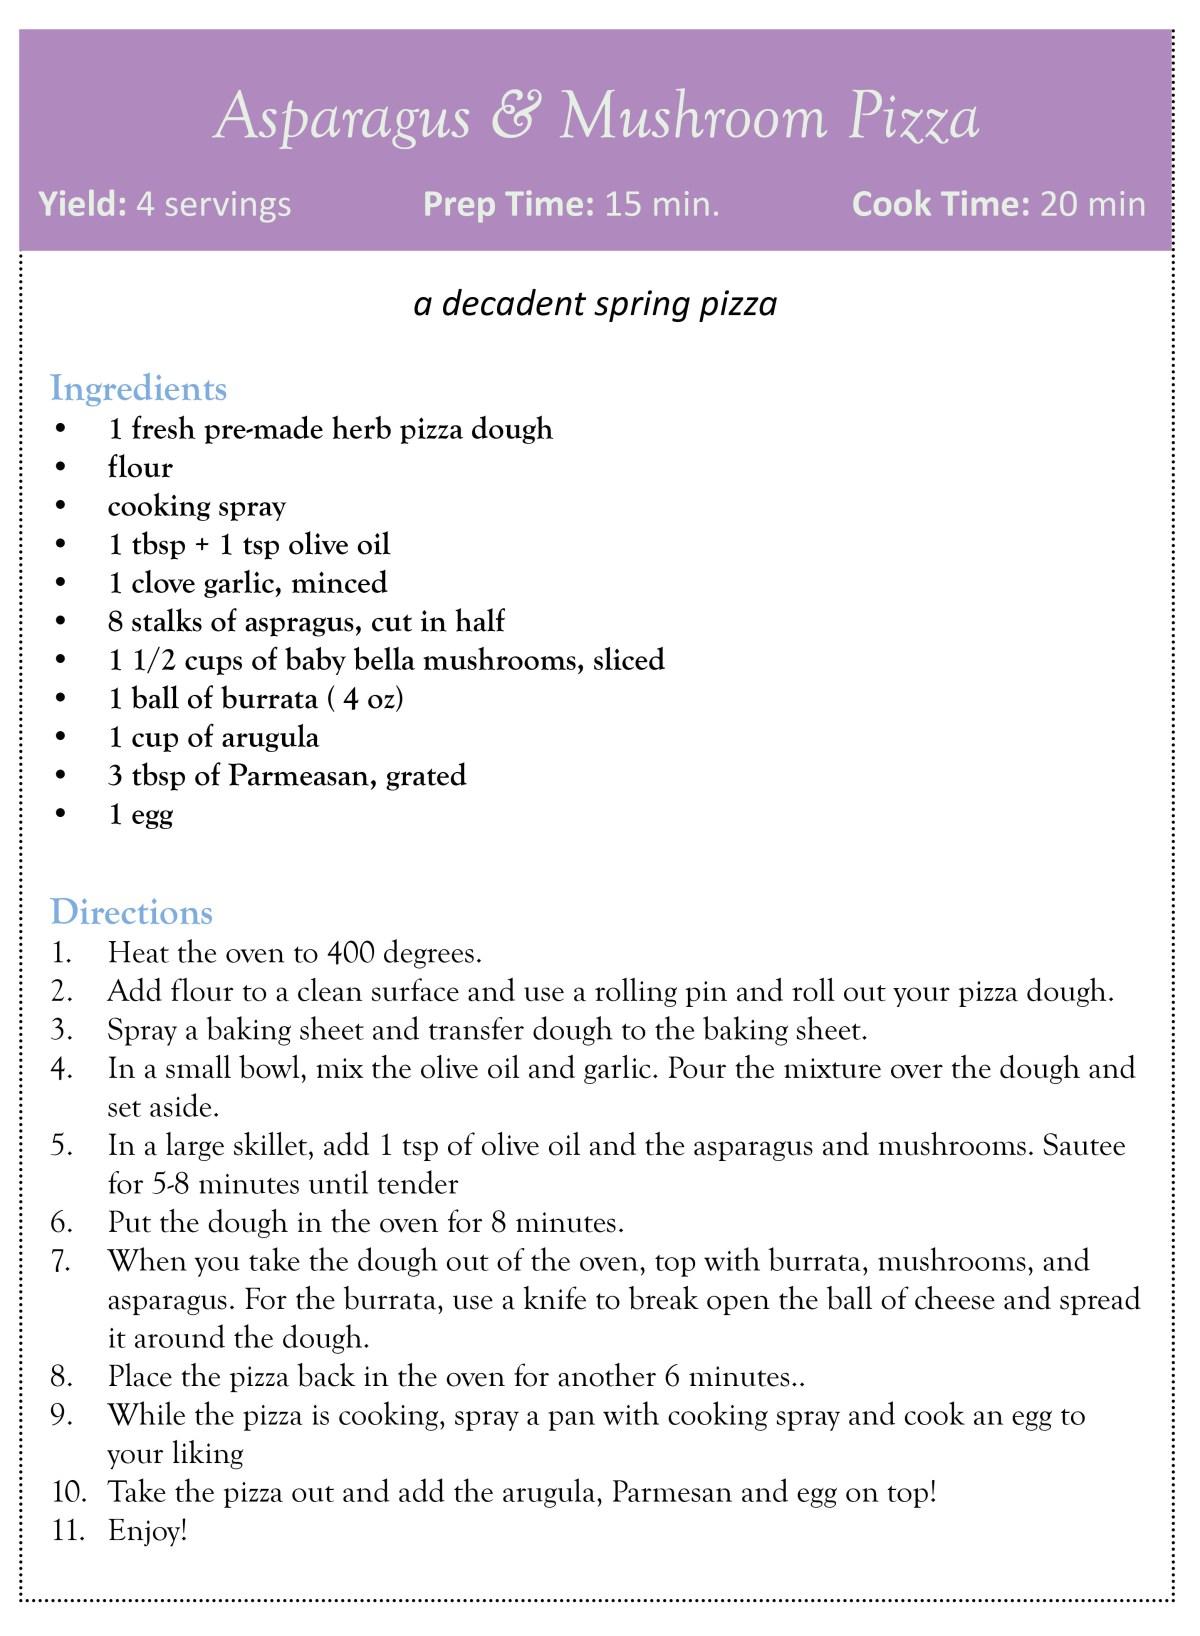 asparagus & mushroom pizza.jpg